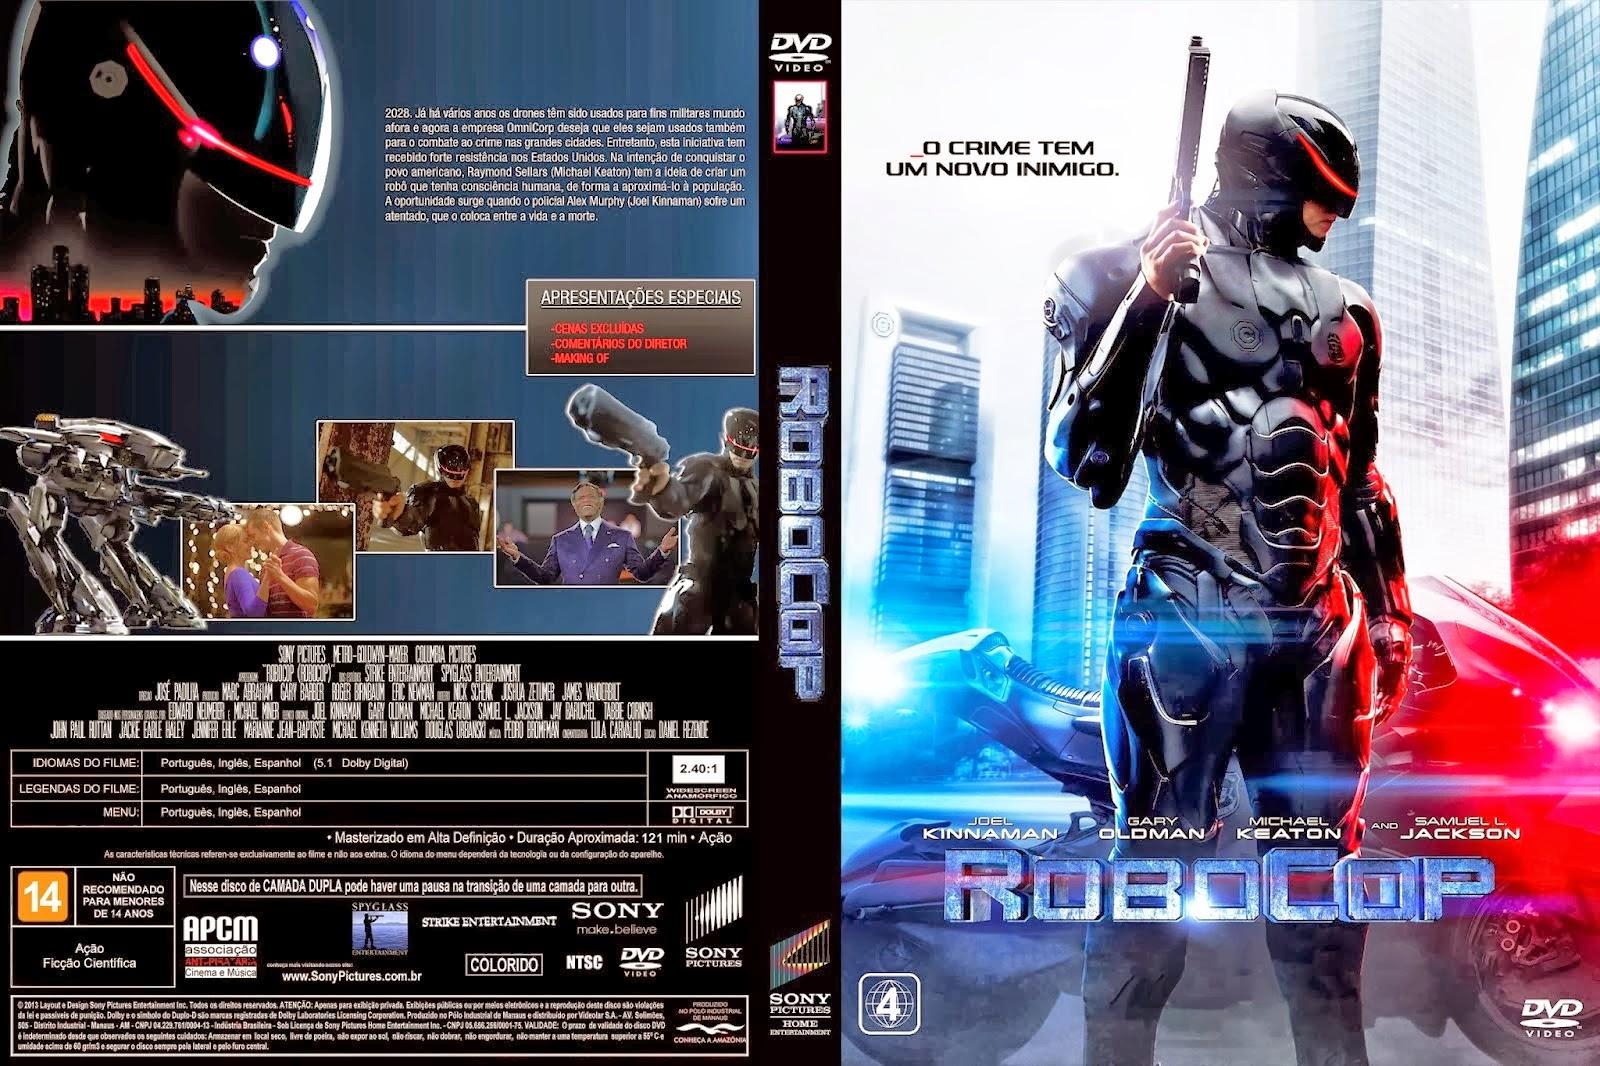 Filme RoboCop 2014 DVD Capa